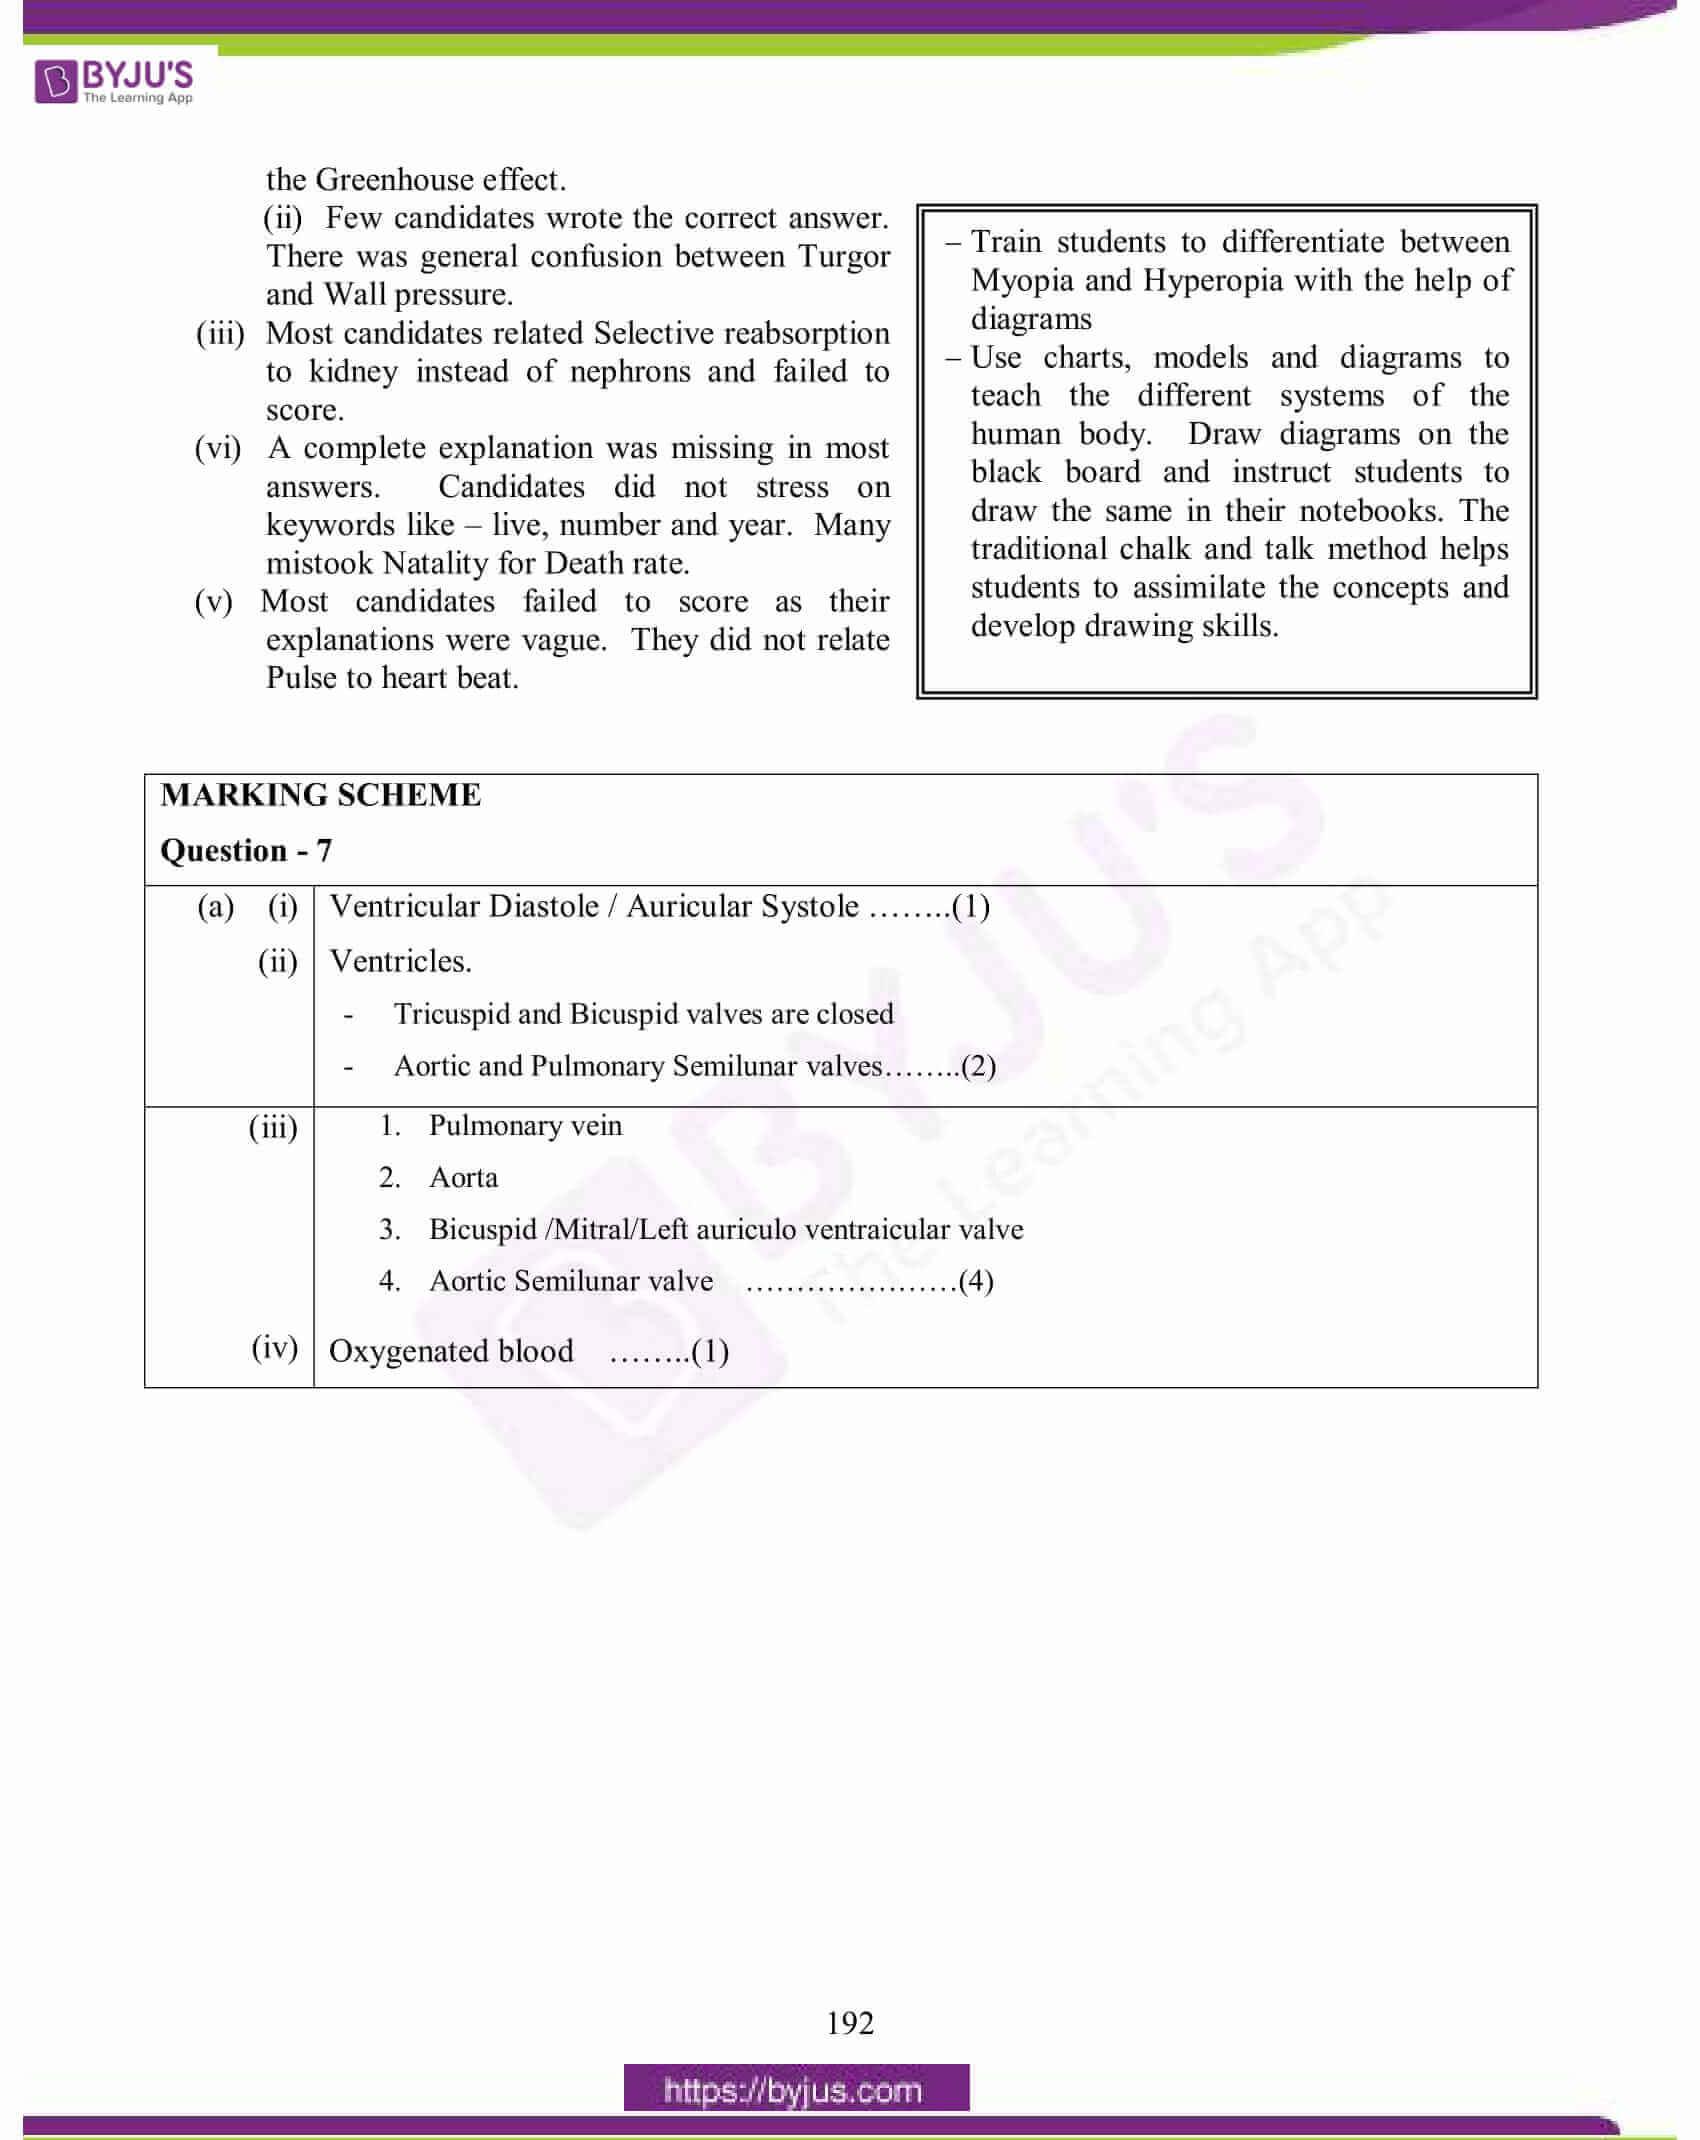 icse class 10 biology question paper solution 2015 19